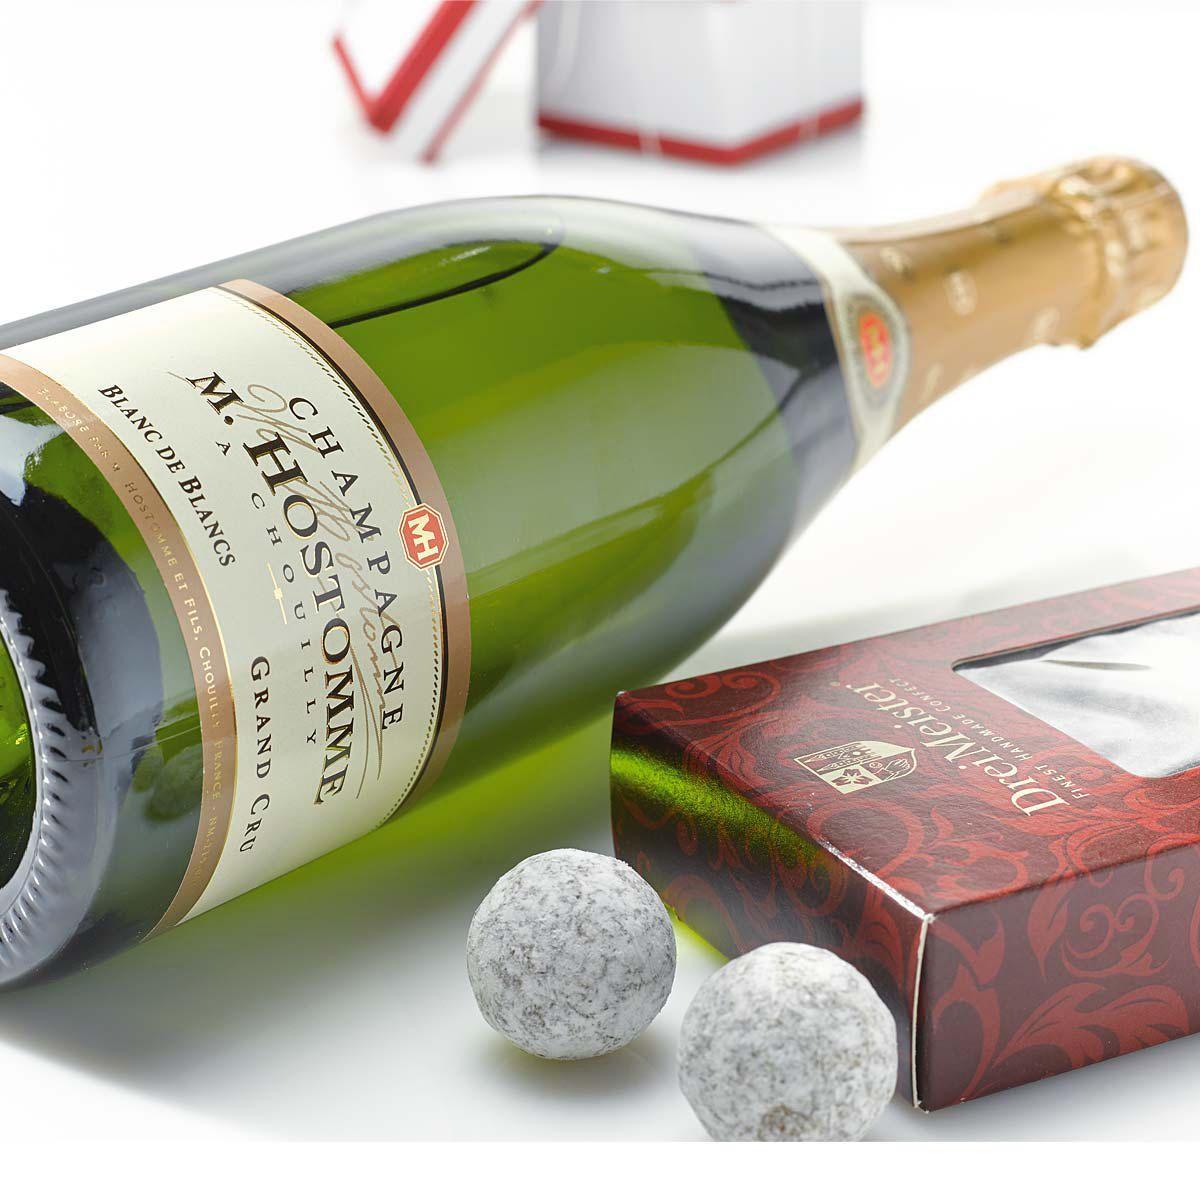 Geschenk-Set, Champagner Hostomme Grand Cru, 100g Champagner Trüffel ...